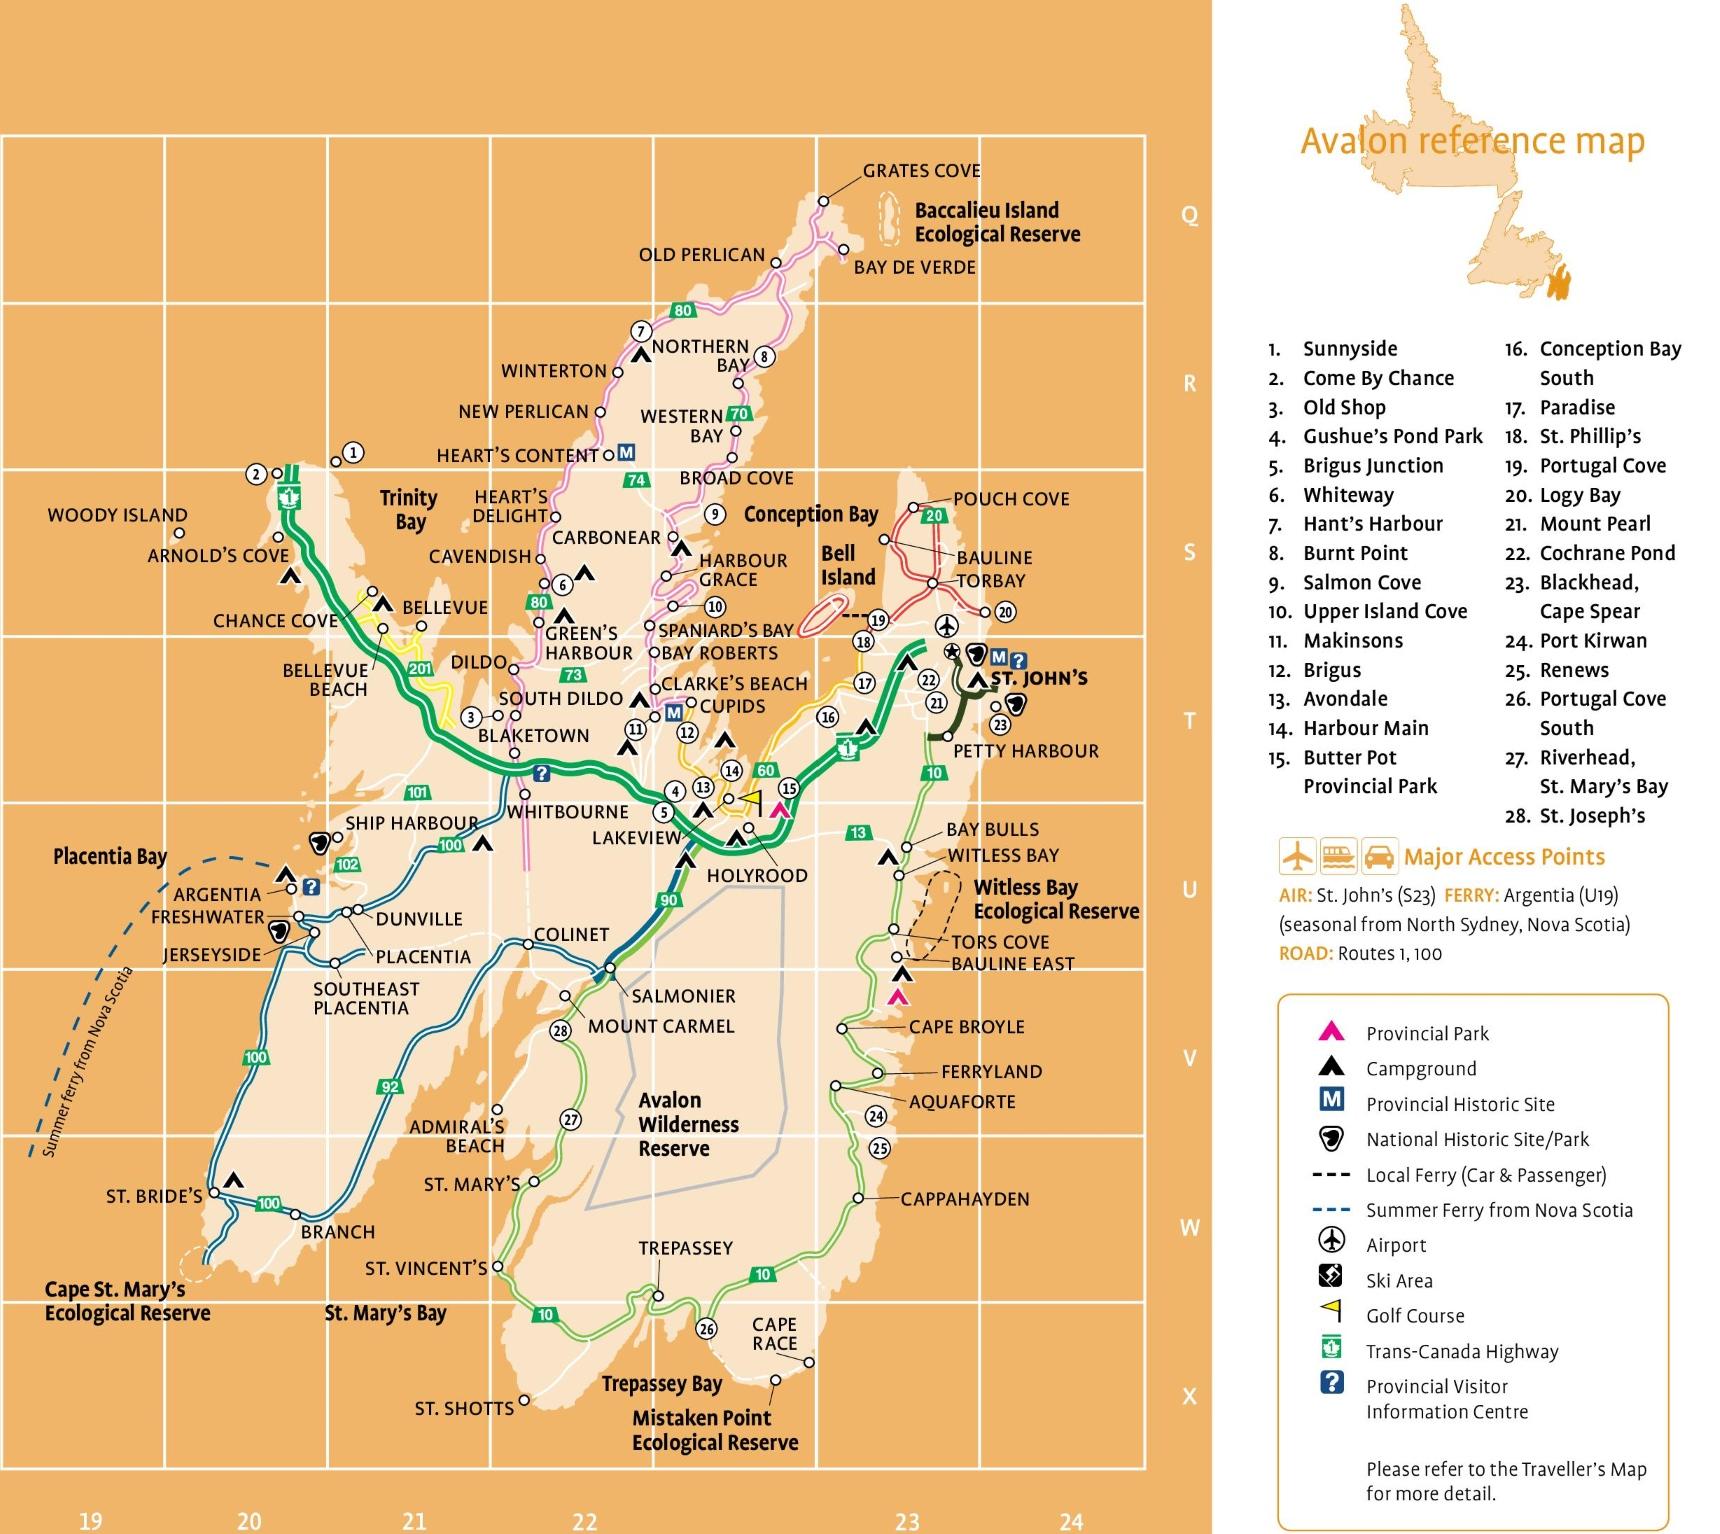 Avalon tourist map